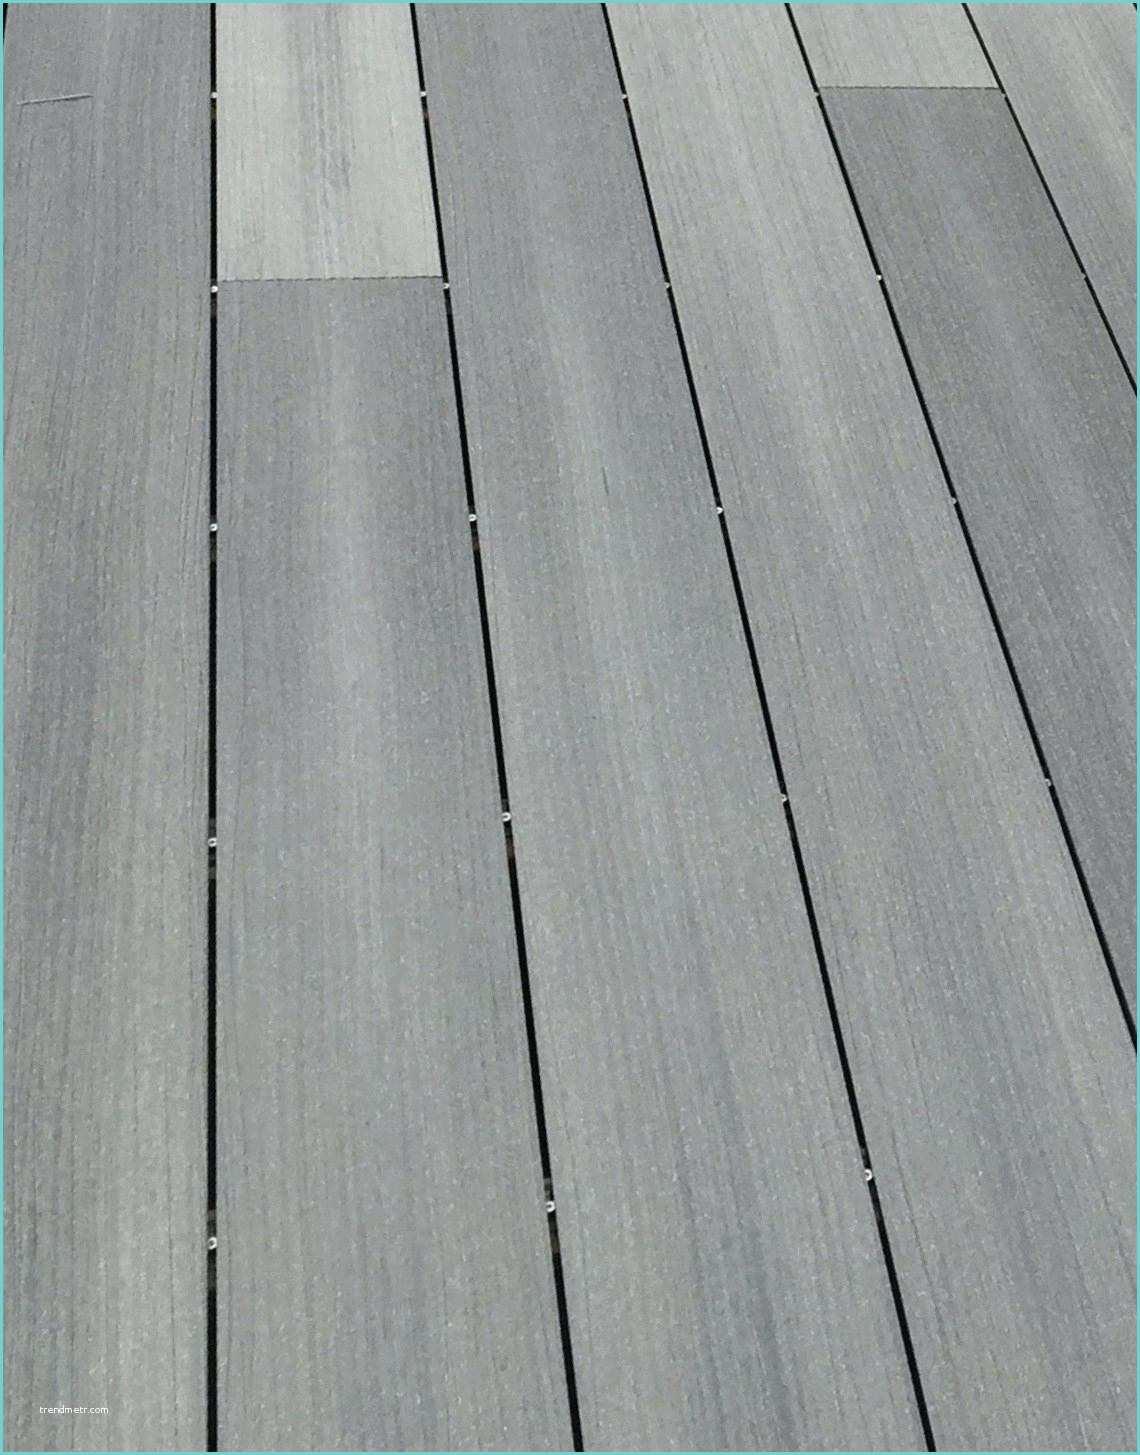 46 Lame De Terrasse Composite Brico Depot | Trendmetr concernant Lame Composite Brico Depot